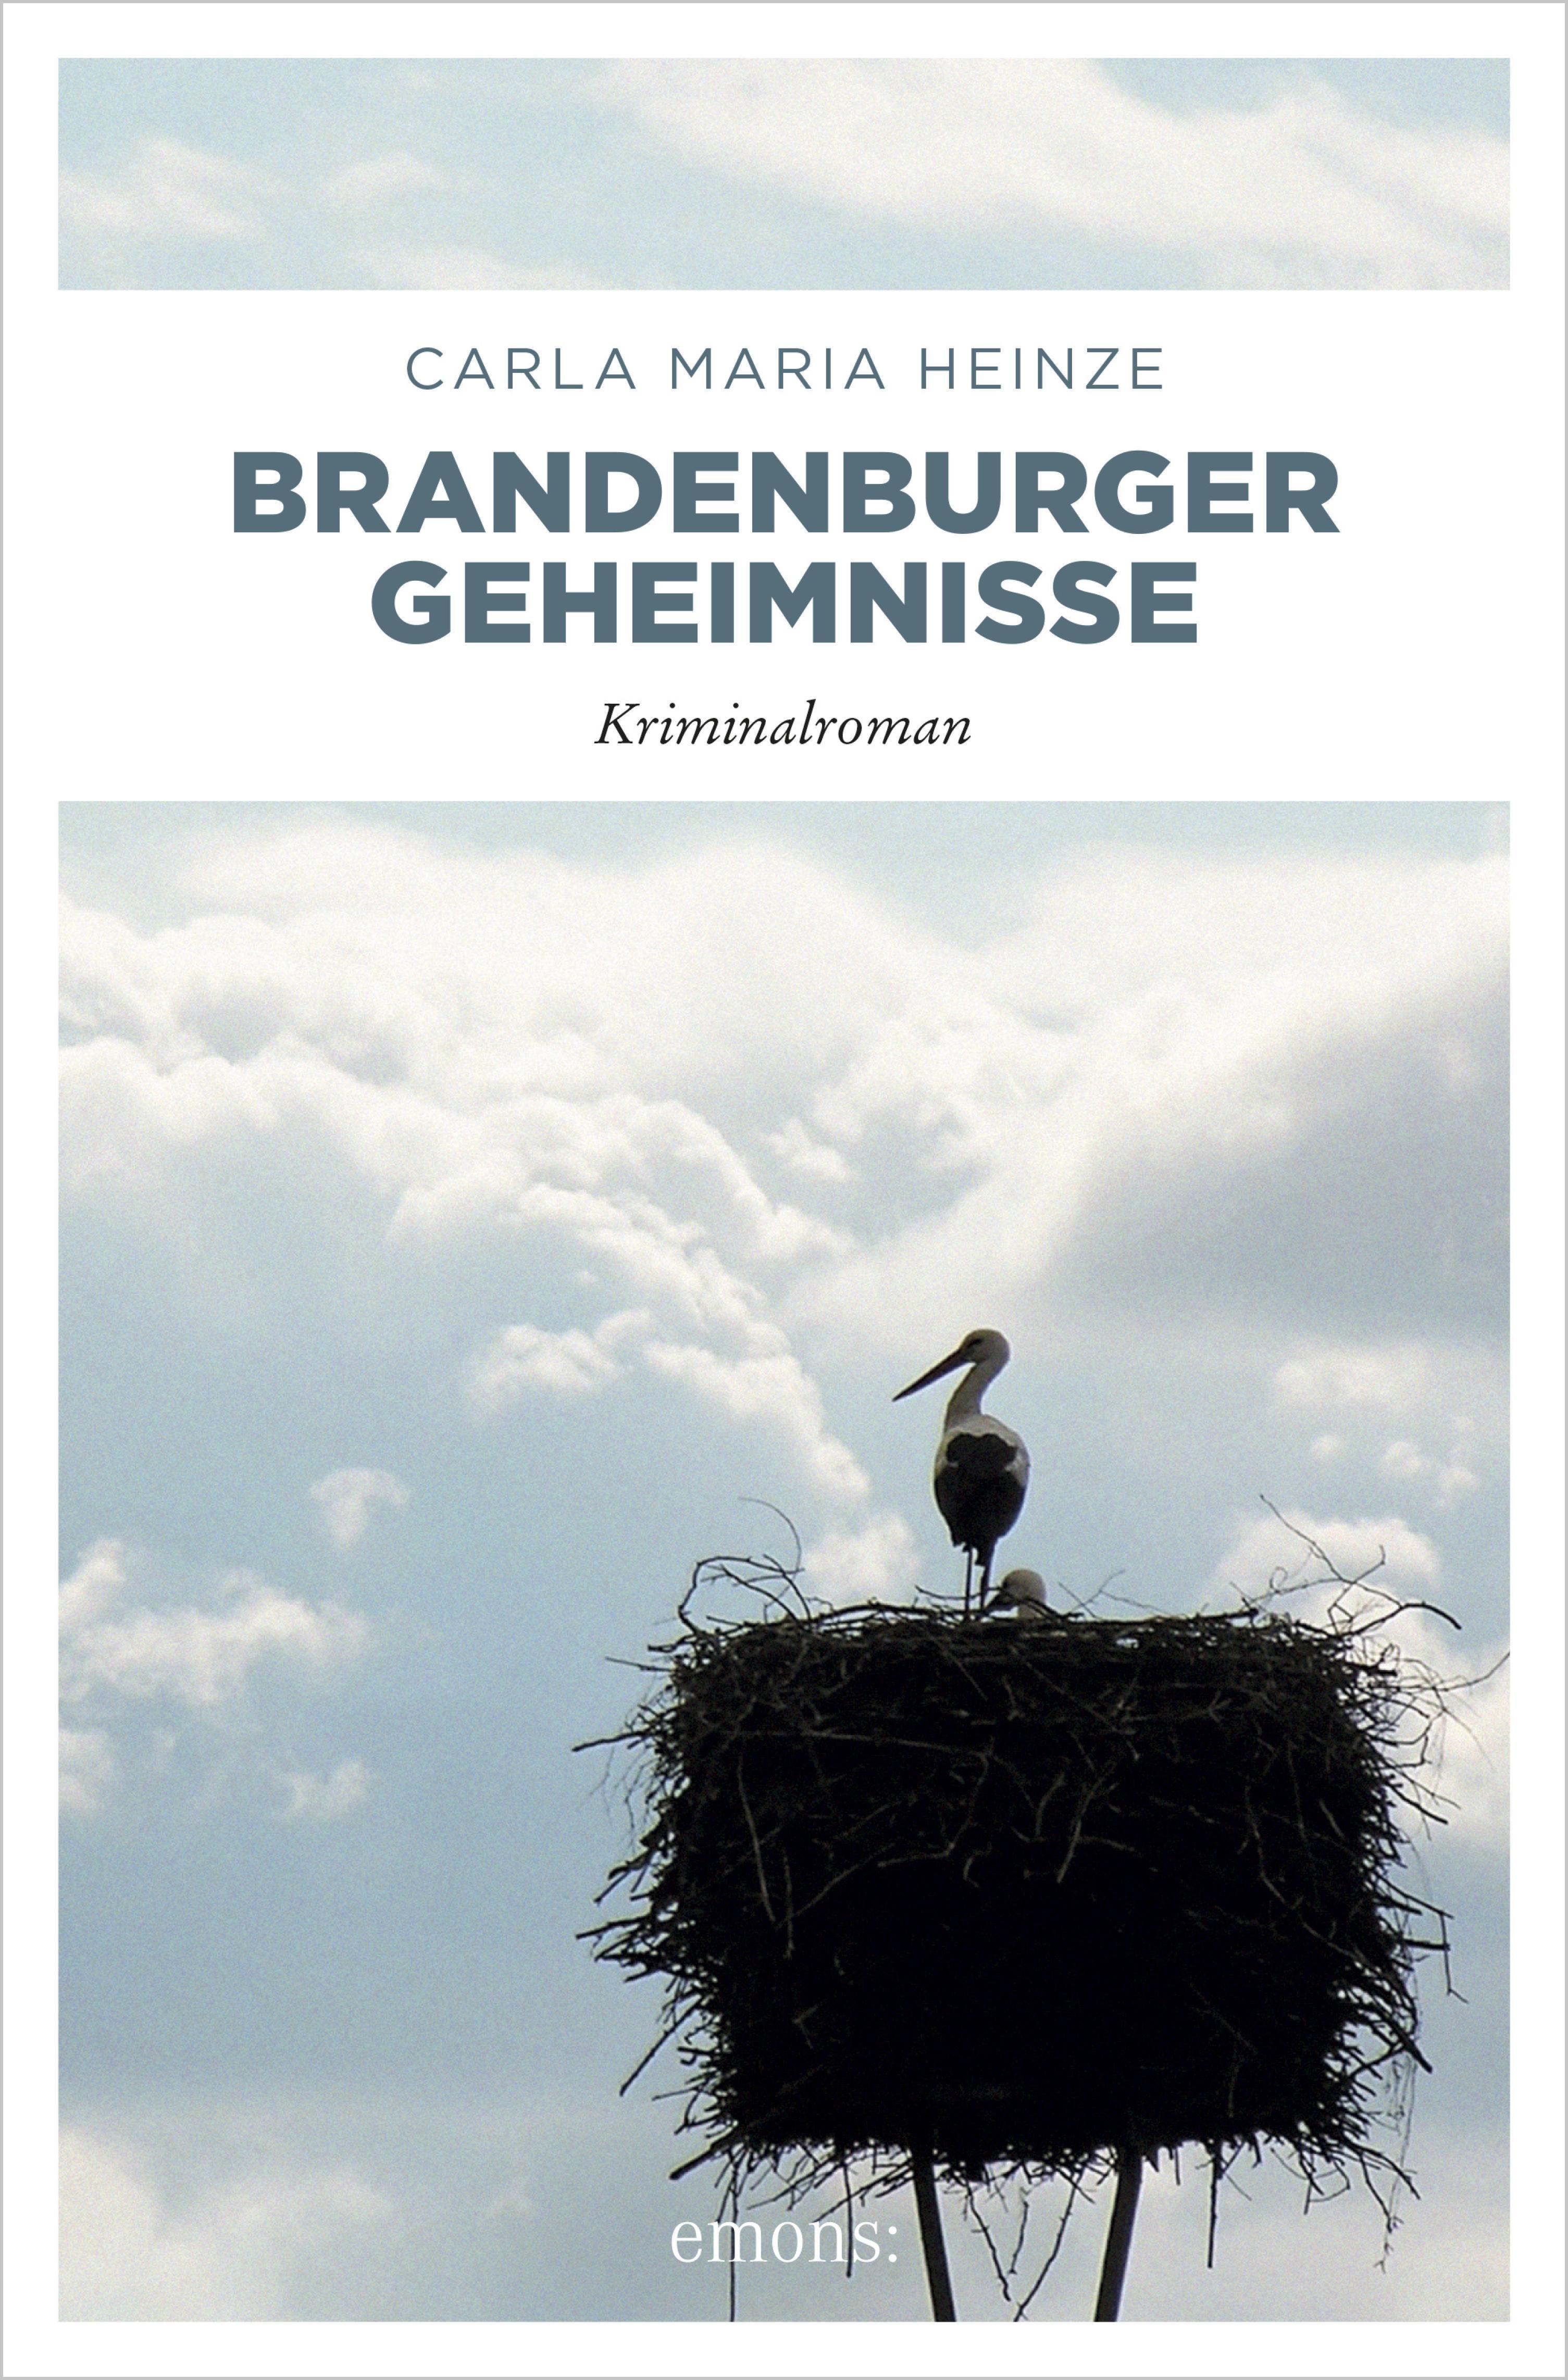 Carla Maria Heinze Brandenburger Geheimnisse сумка maria carla